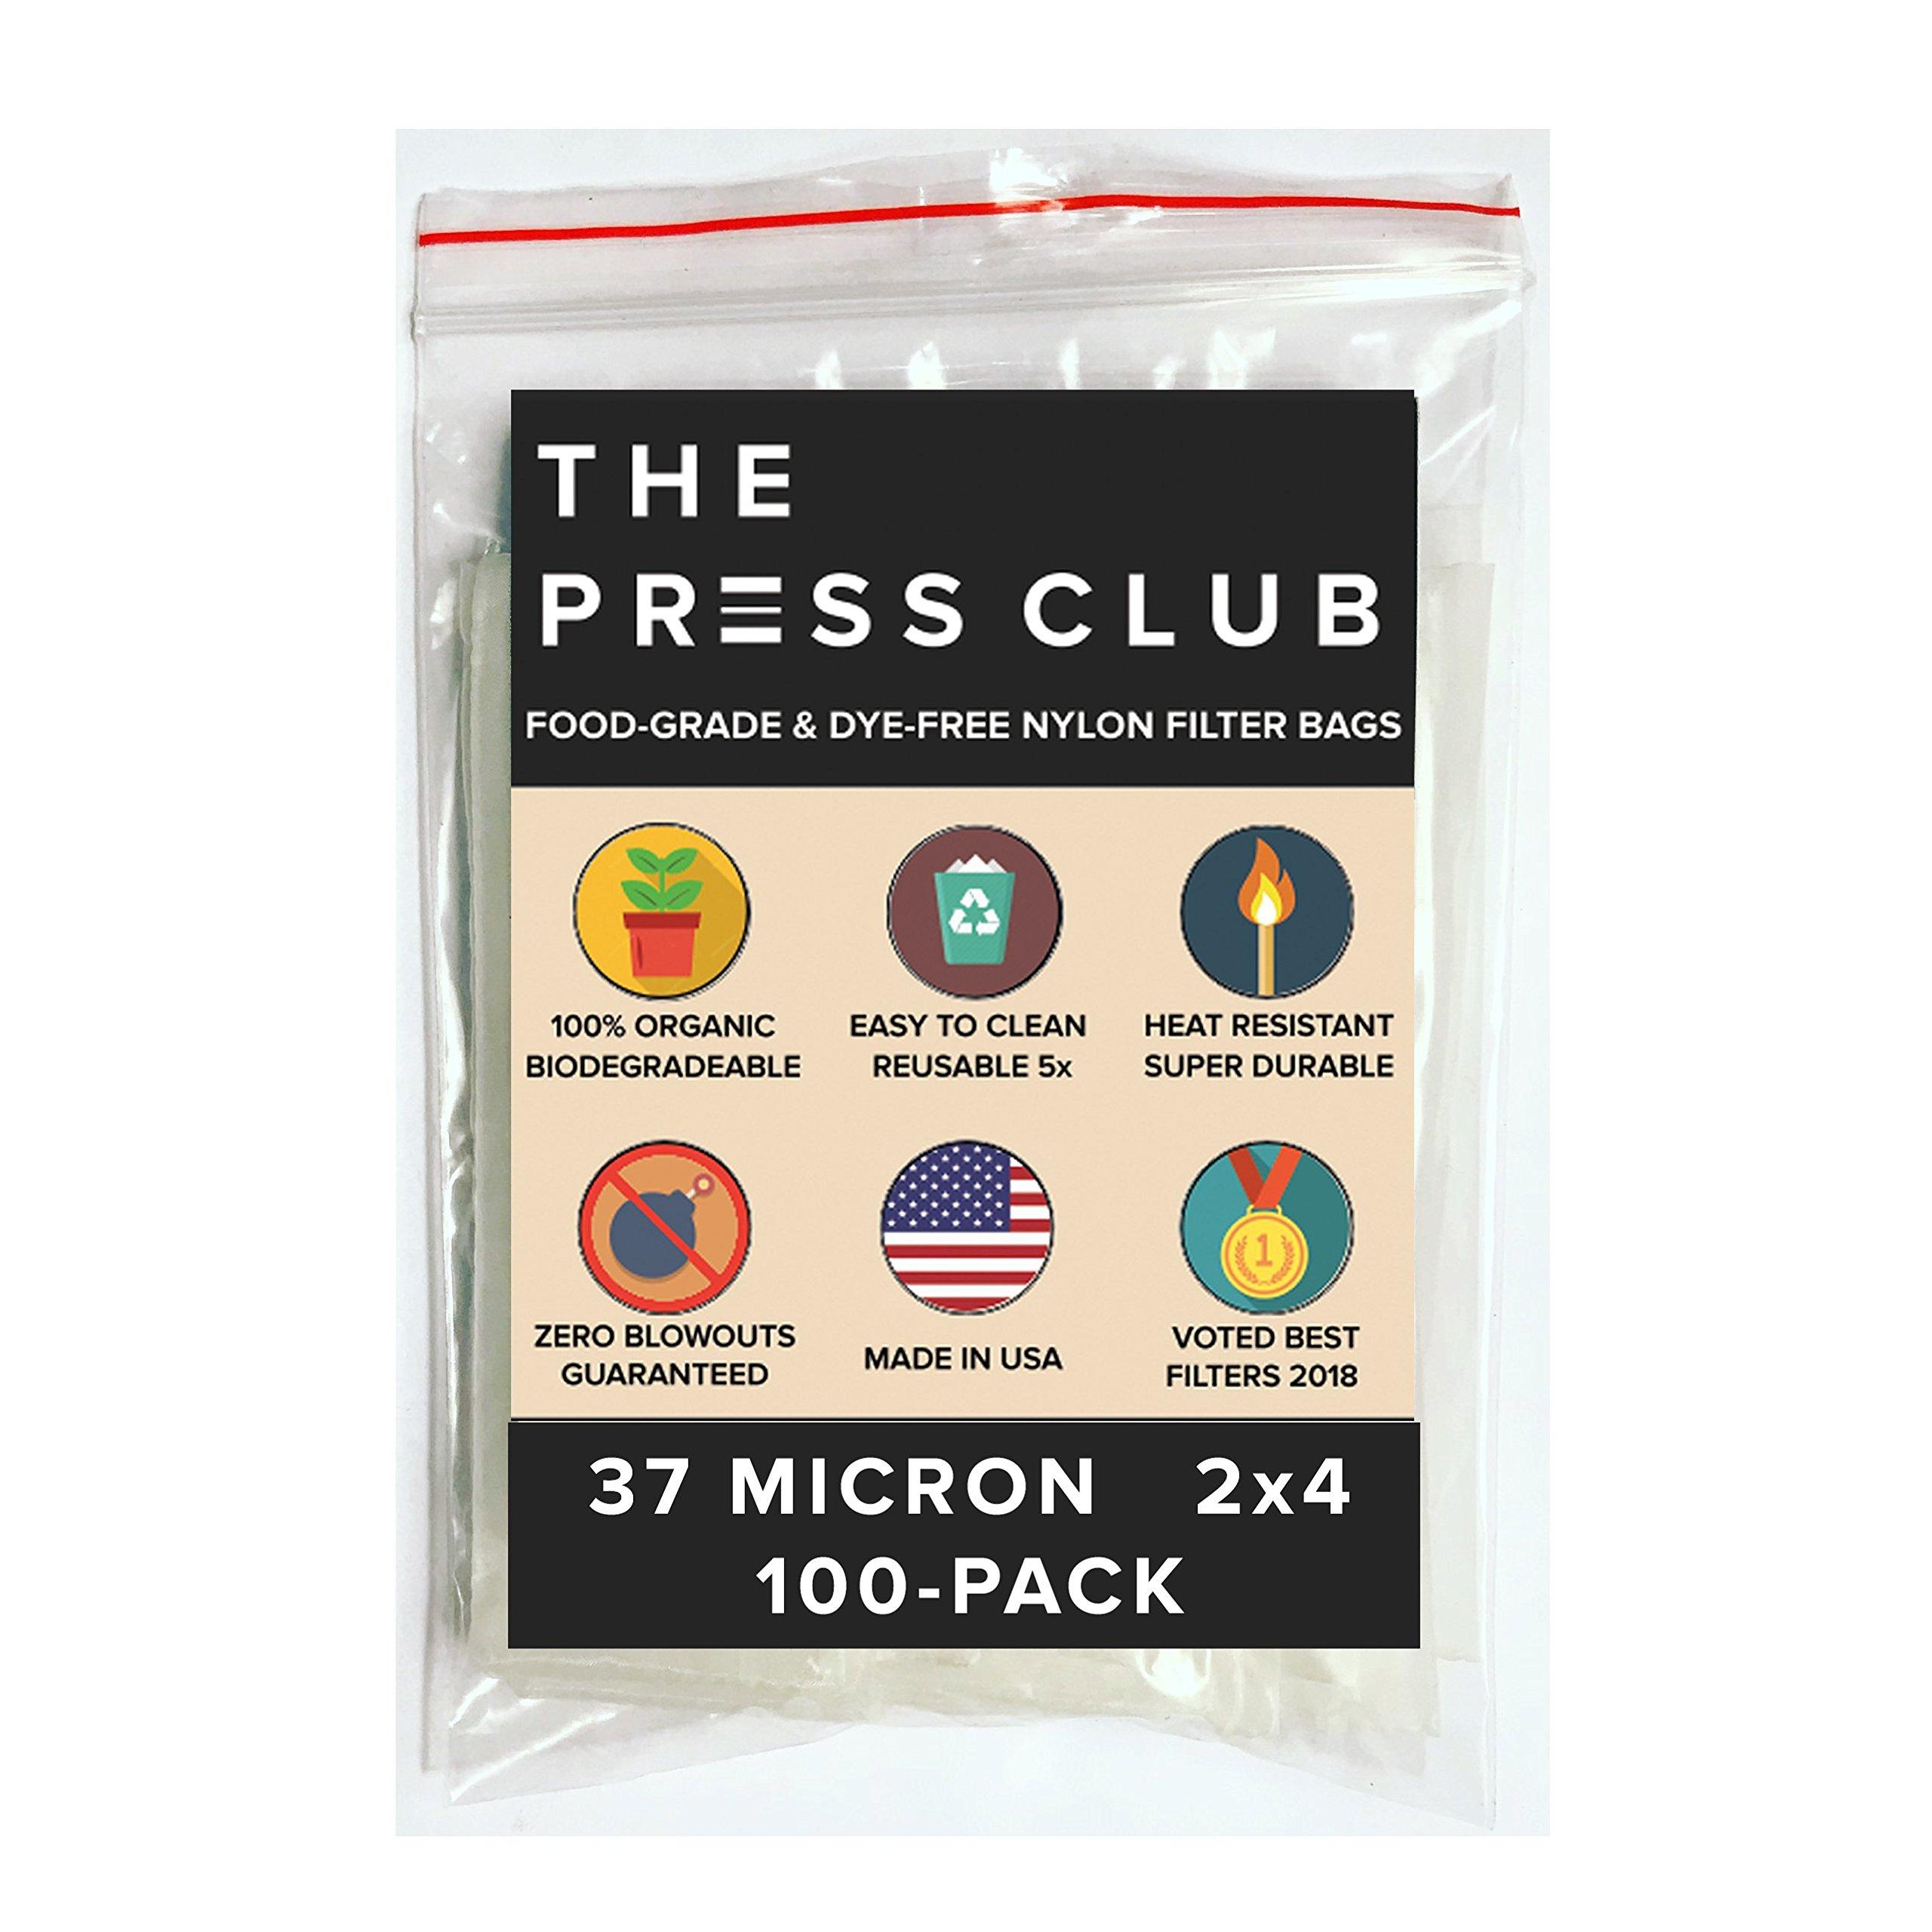 37 Micron | Premium Nylon Tea Filter Press Screen Bags | 2'' x 4'' | 100 Pack | Zero Blowout Guarantee | All Micron & Sizes Available